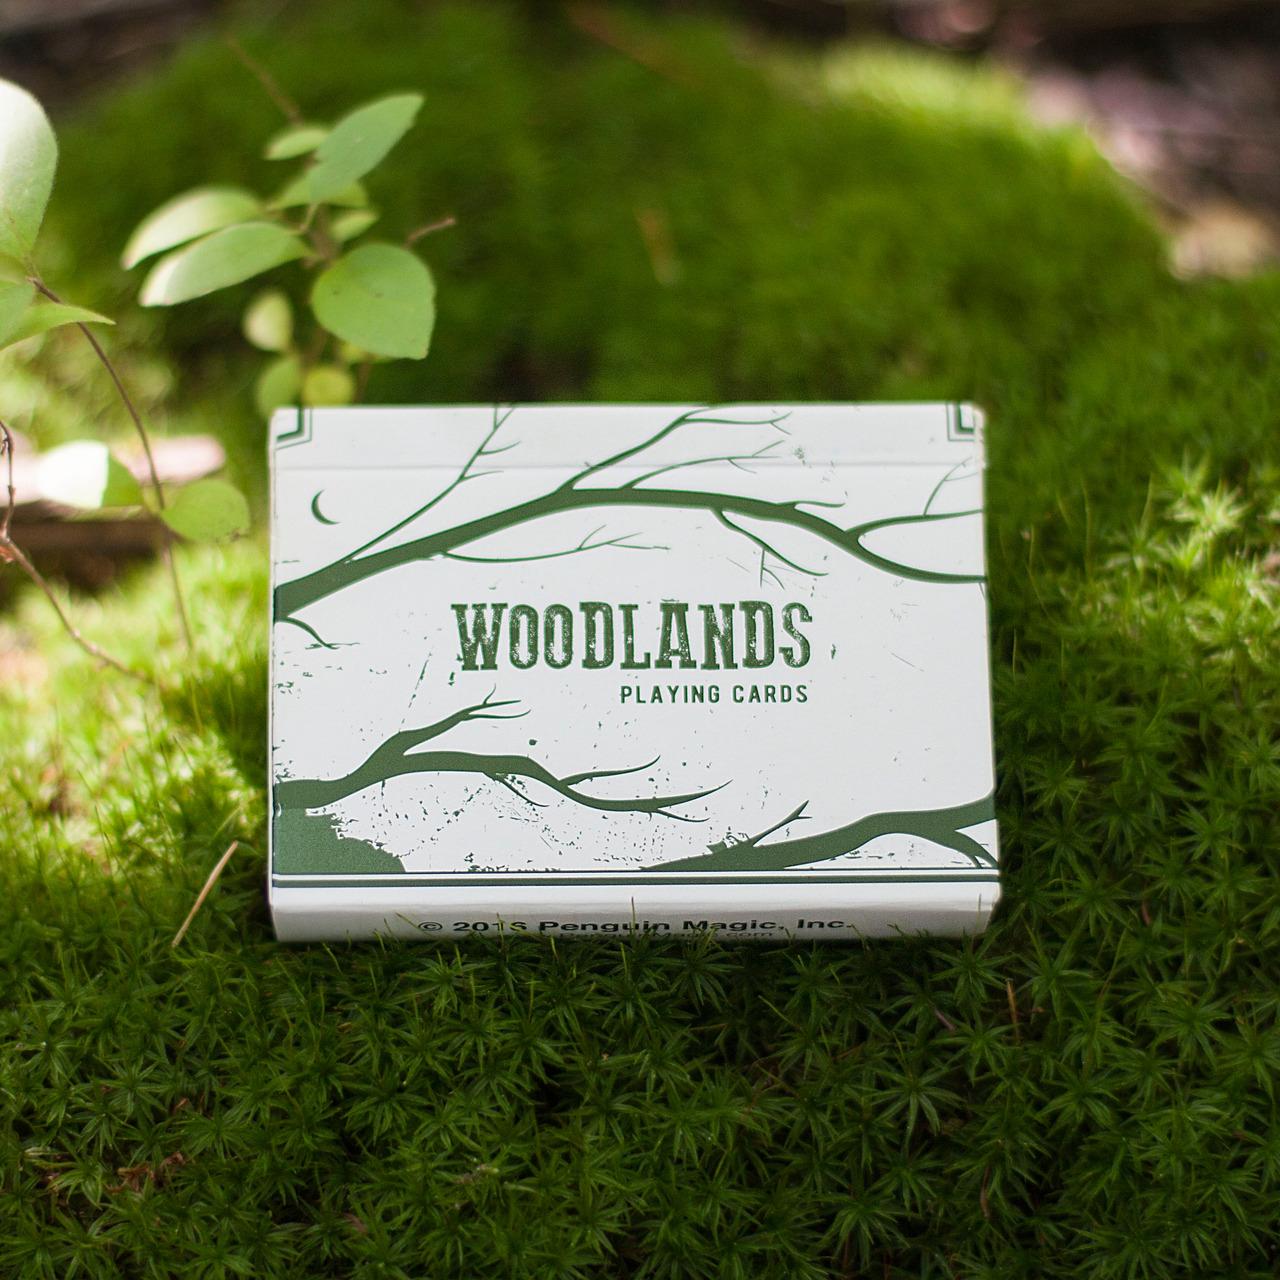 Woodlands dating